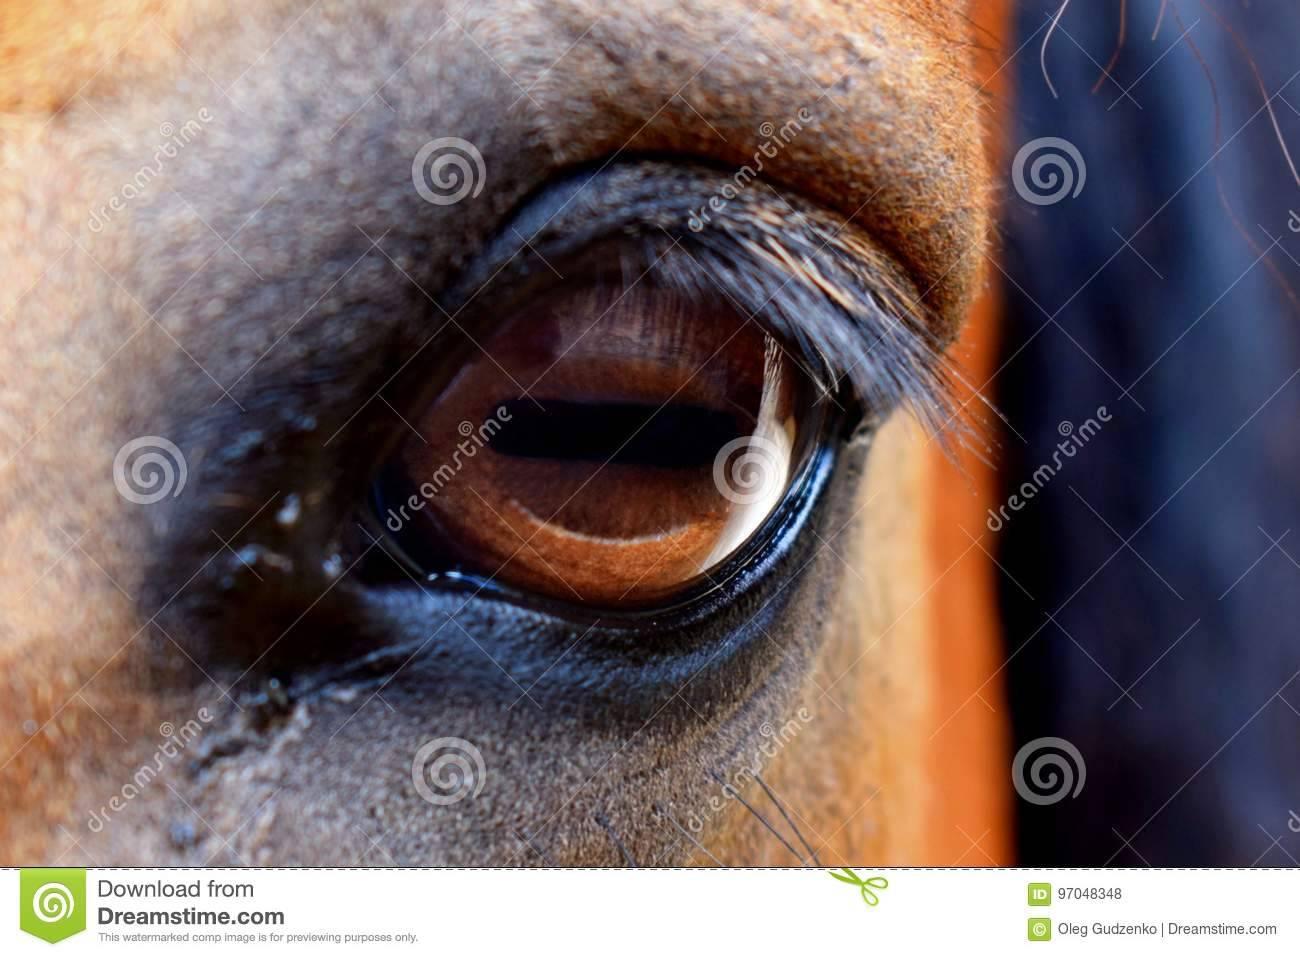 Зрение лошади и особенности глаз